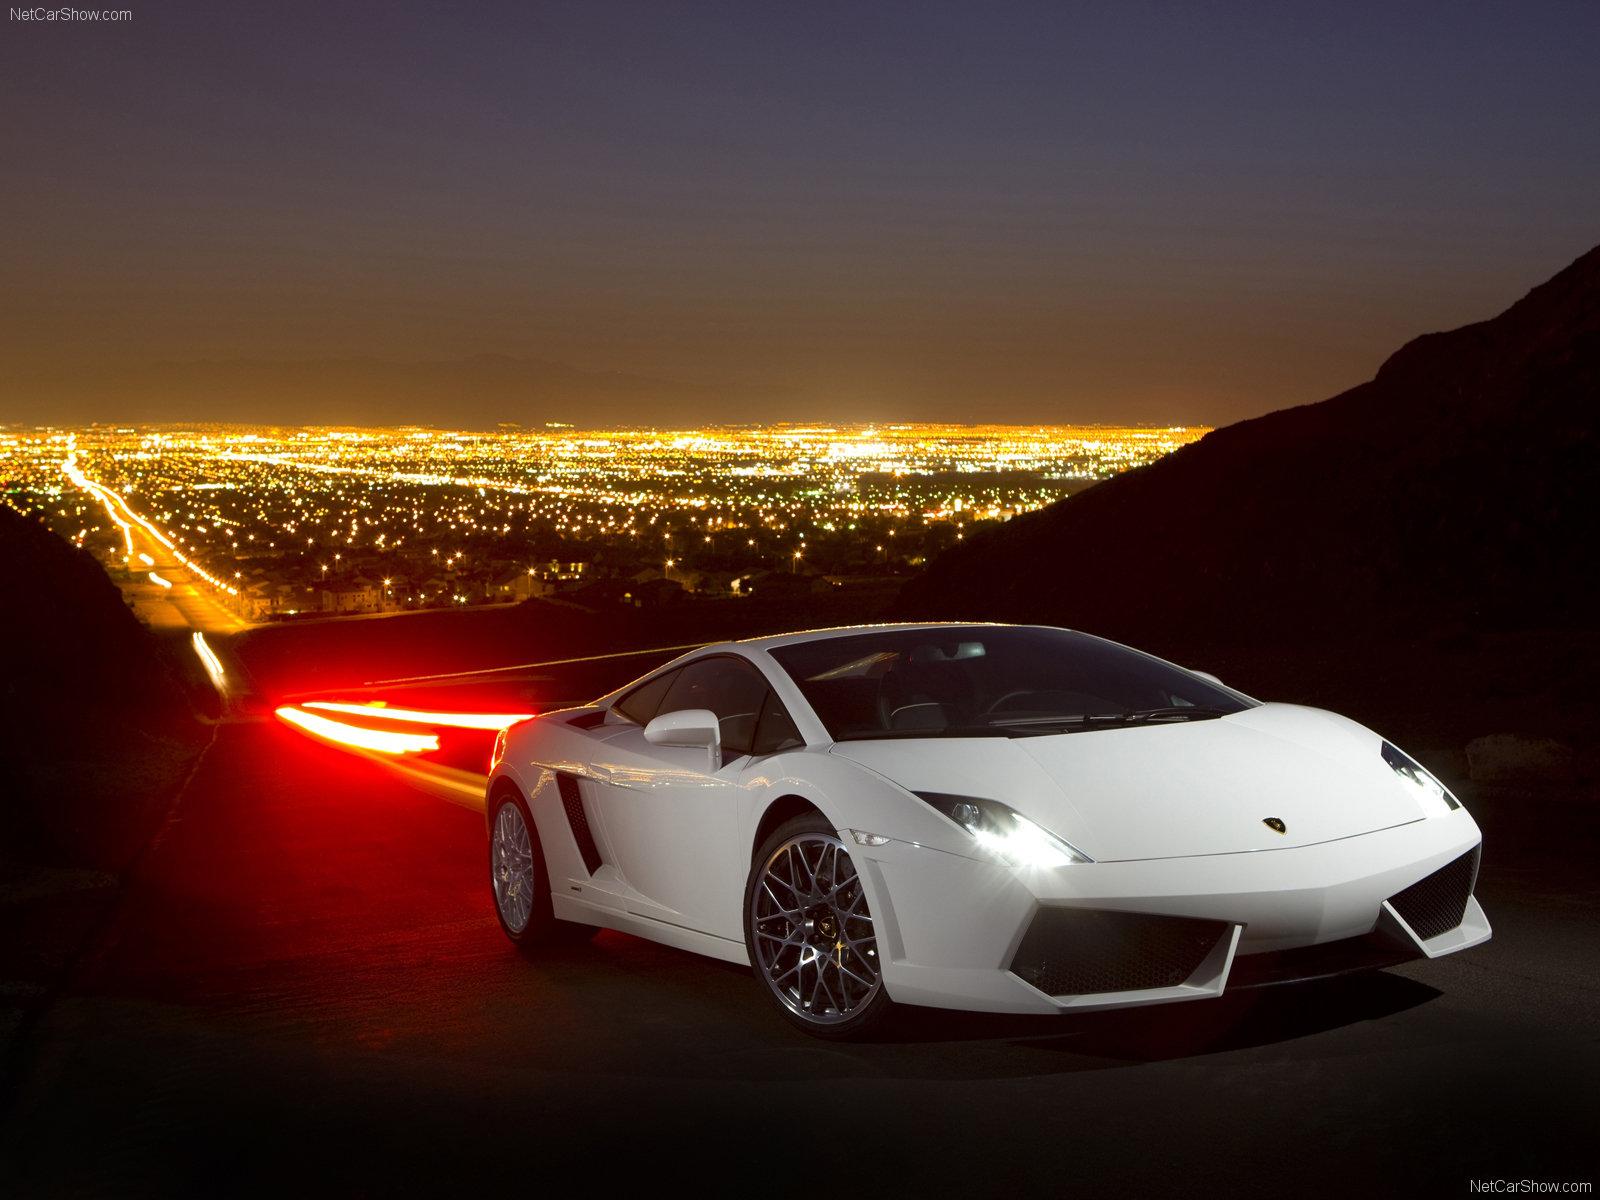 Lamborghini Gallardo Wallpapers For Windows 8 .